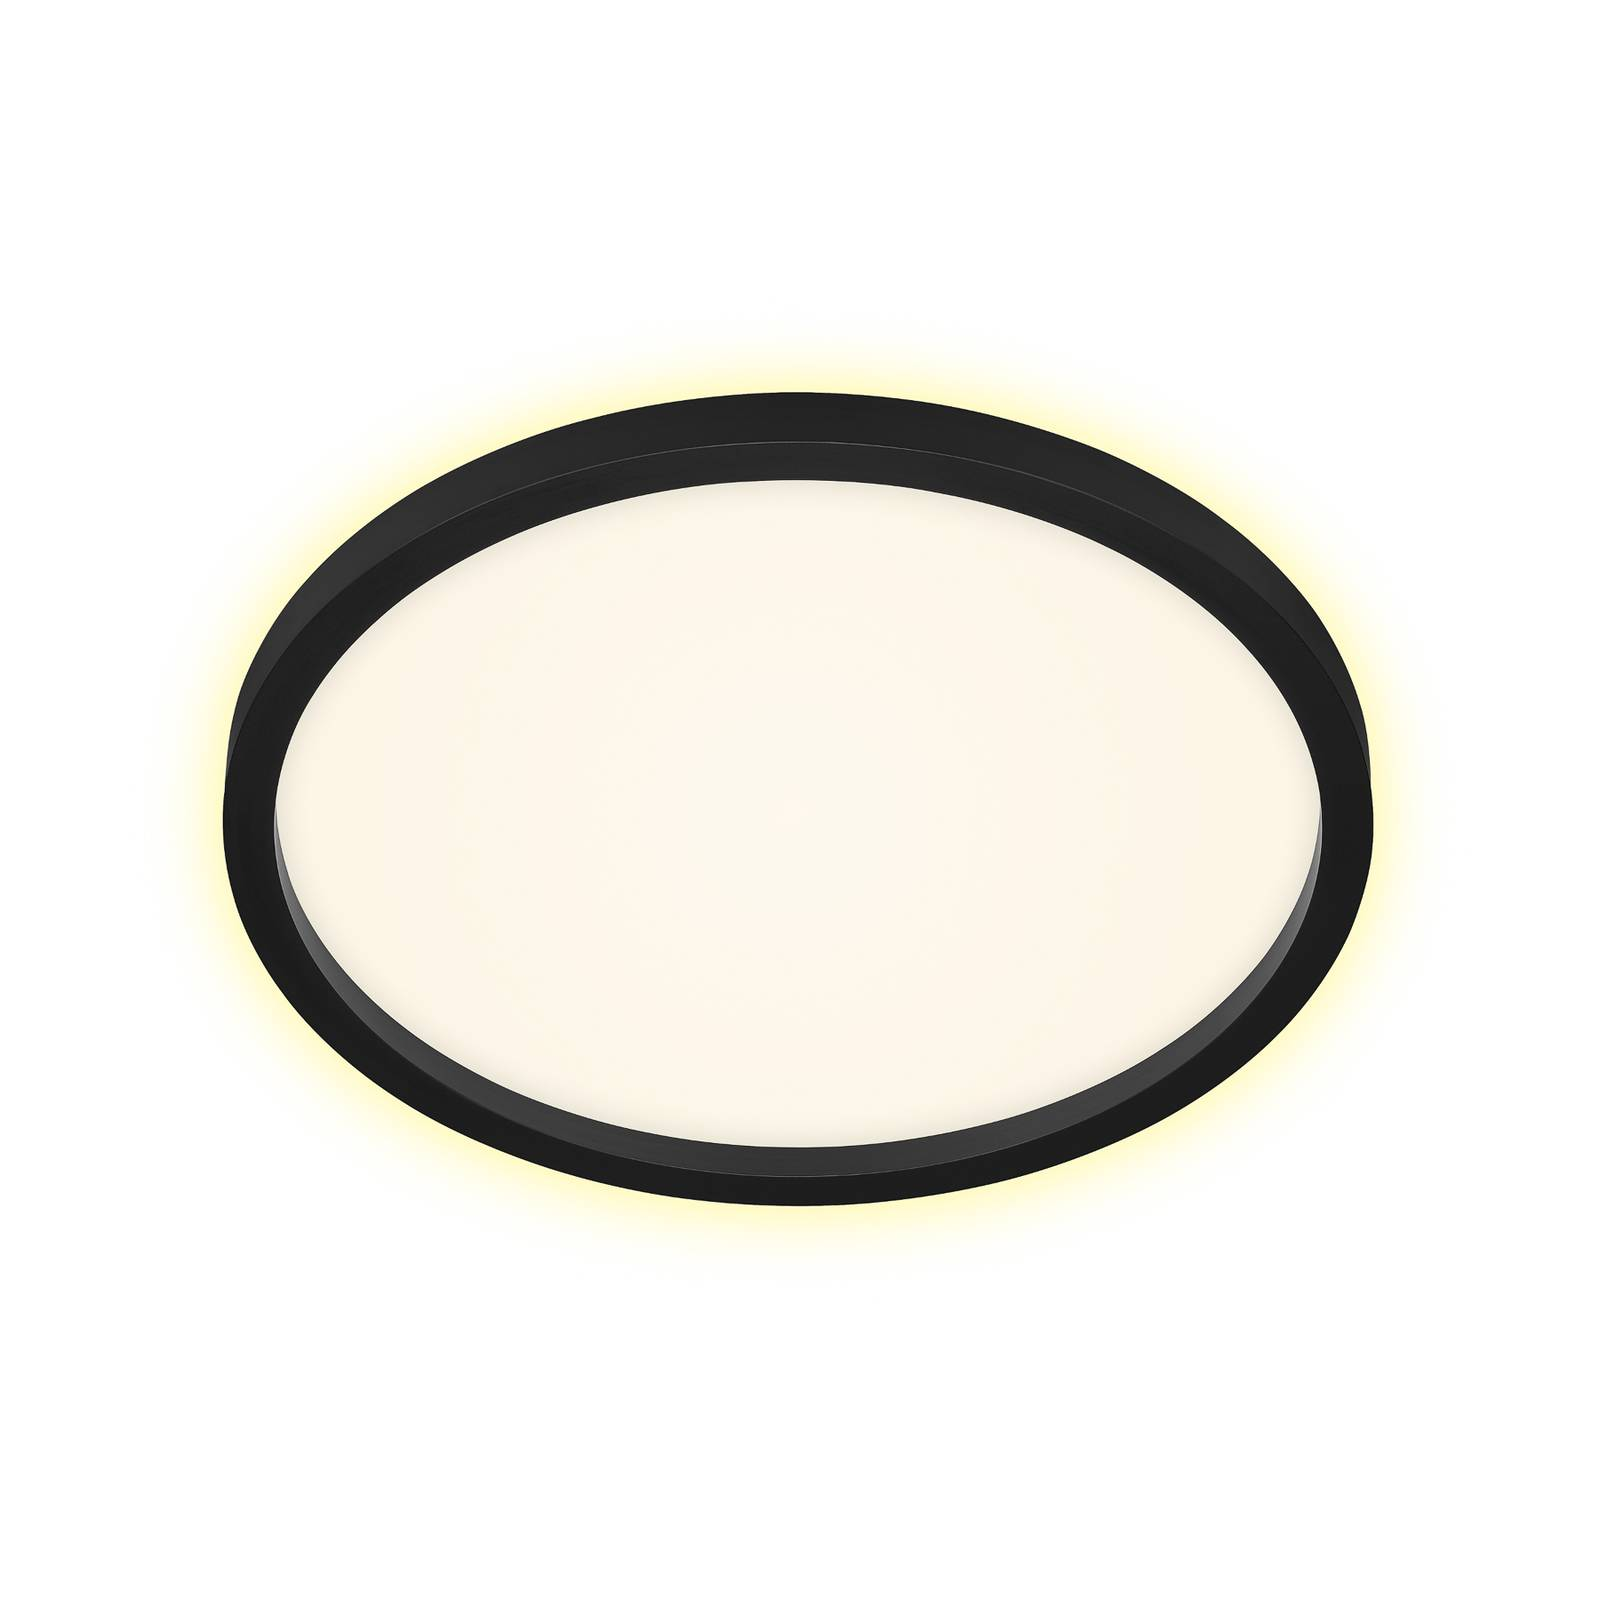 Prios Avira -LED-kattovalaisin pyöreä, 42 cm